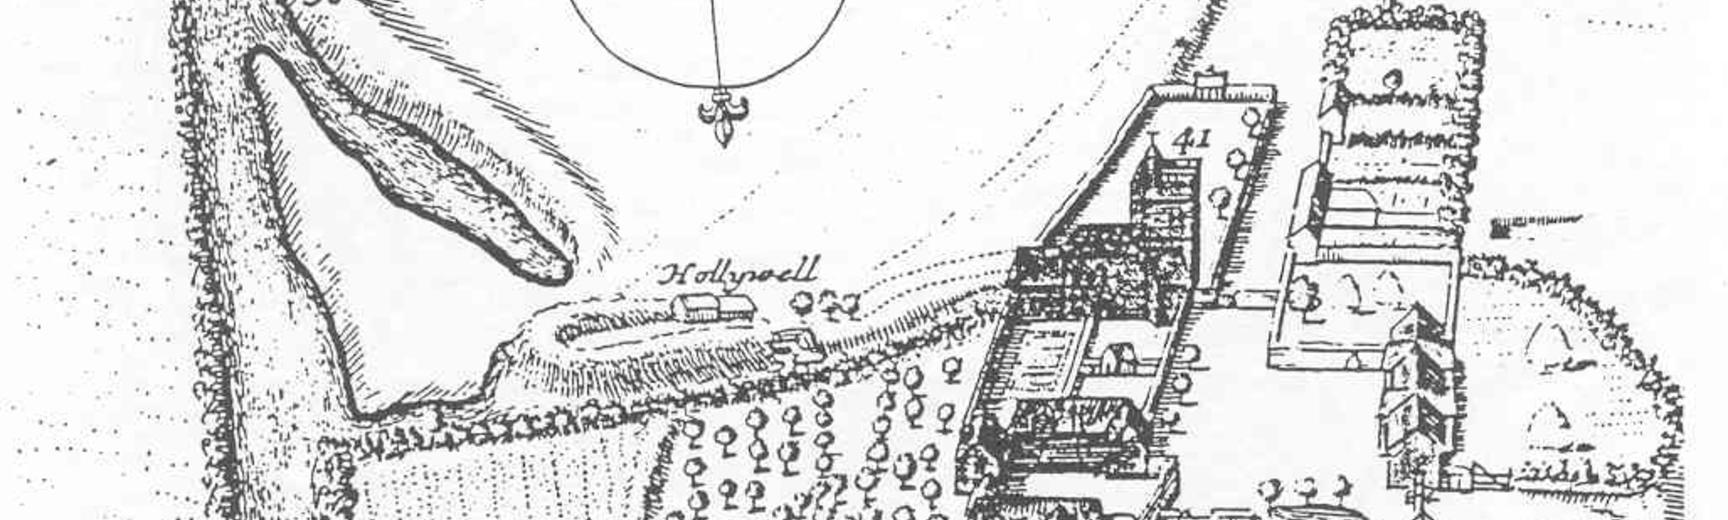 1675 Loggan Map Holywell